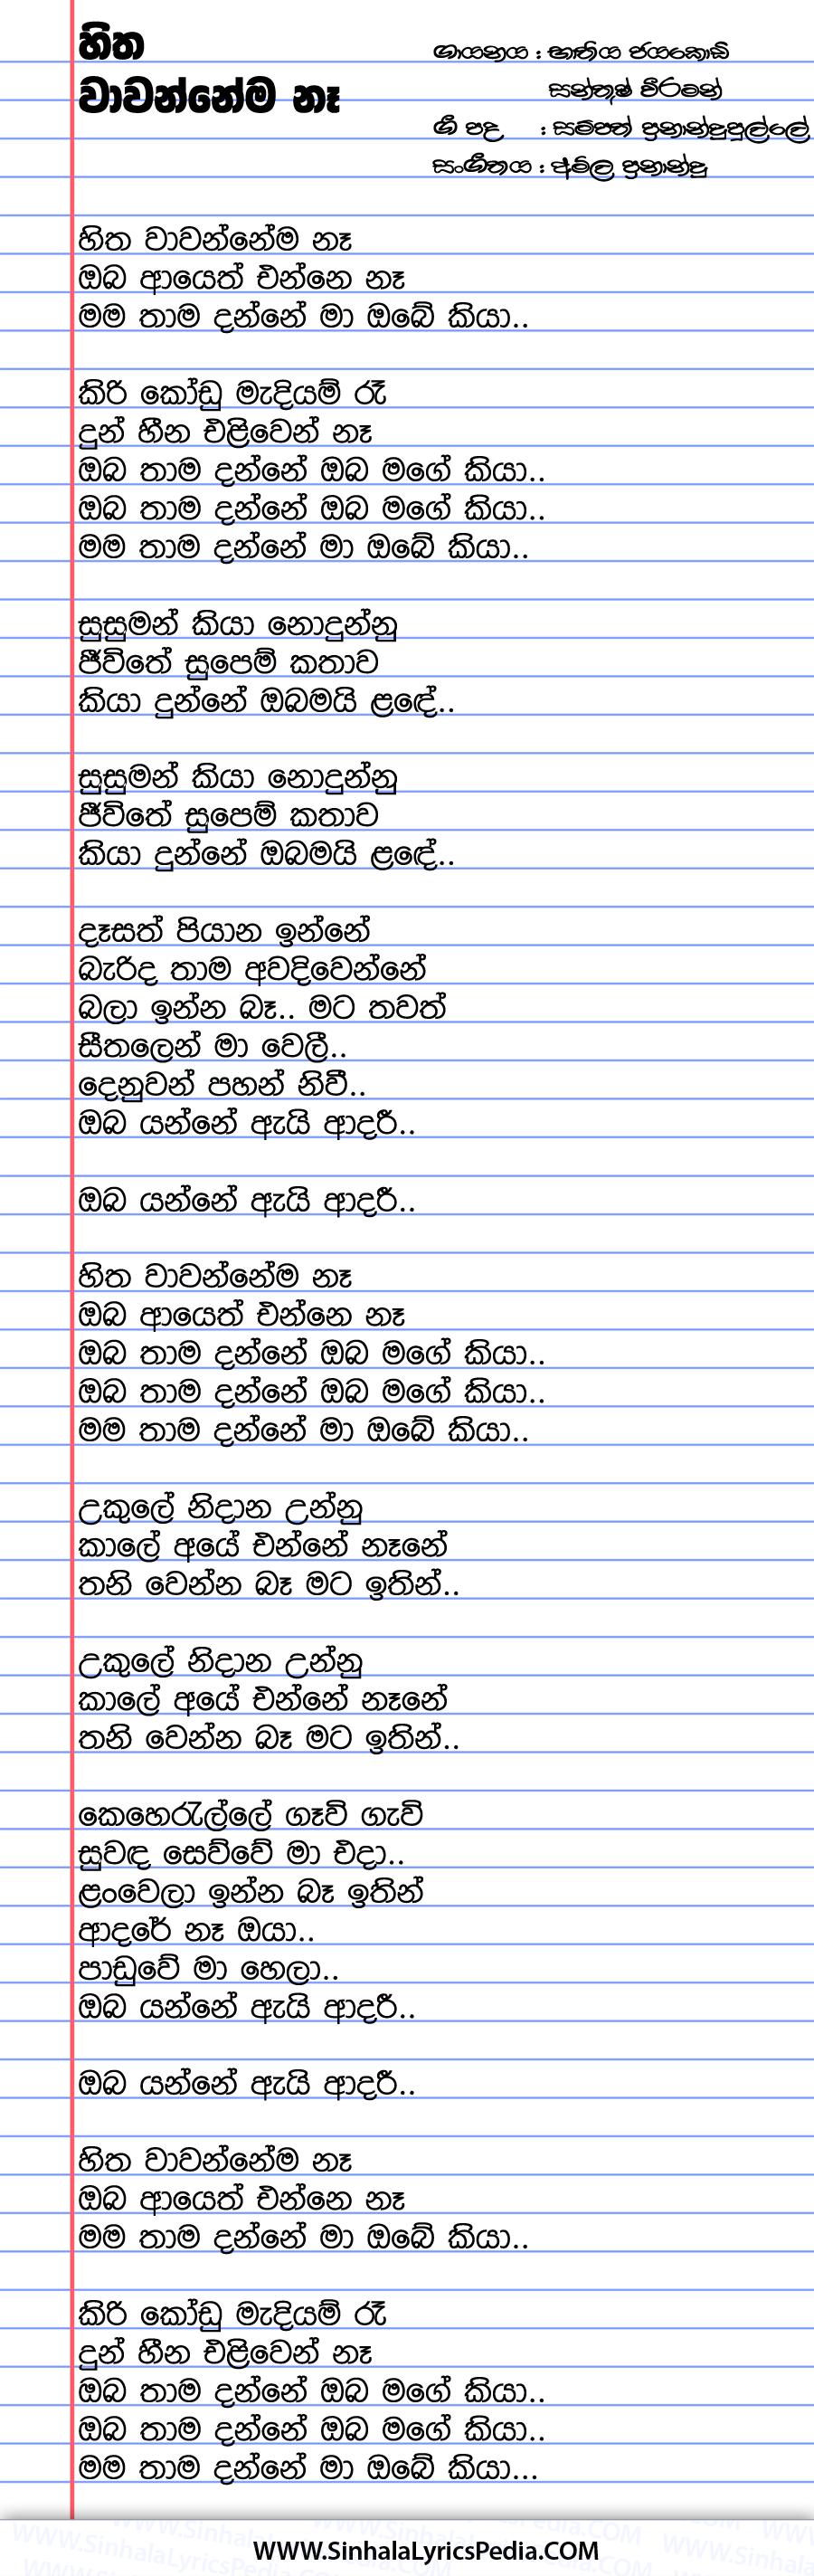 Hitha Wawannema Ne Song Lyrics